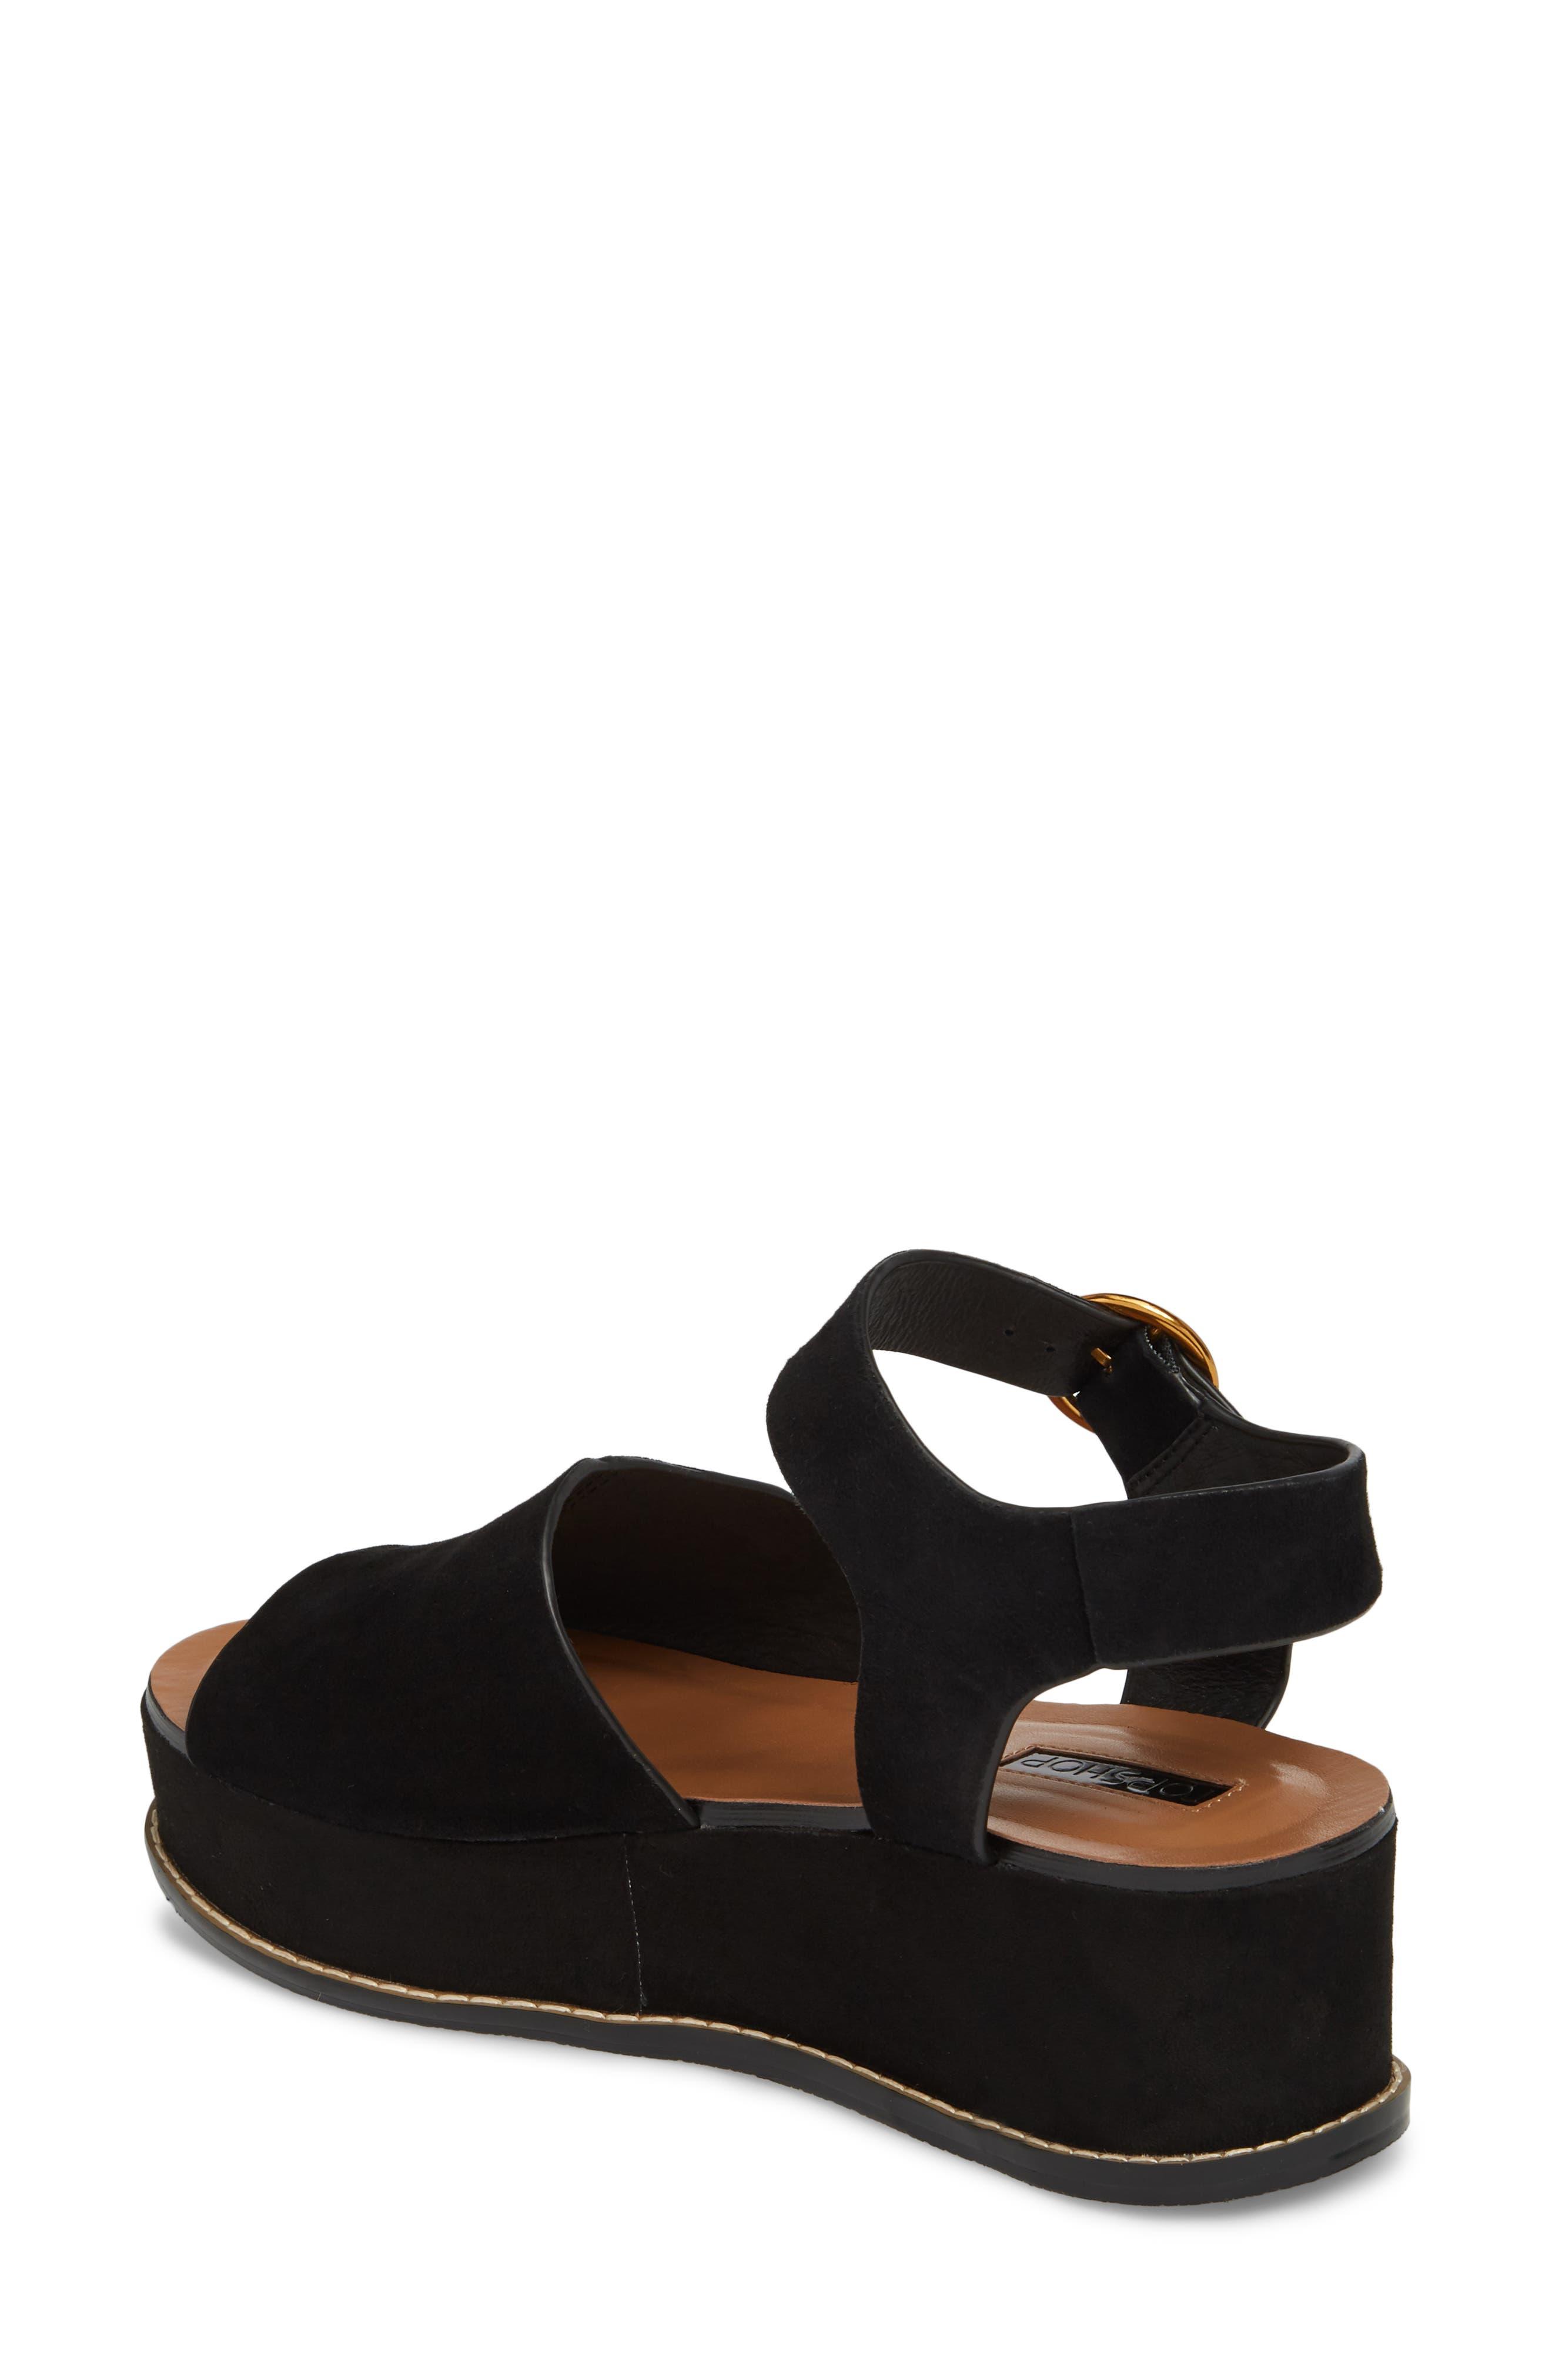 Wow Platform Wedge Sandal,                             Alternate thumbnail 2, color,                             001